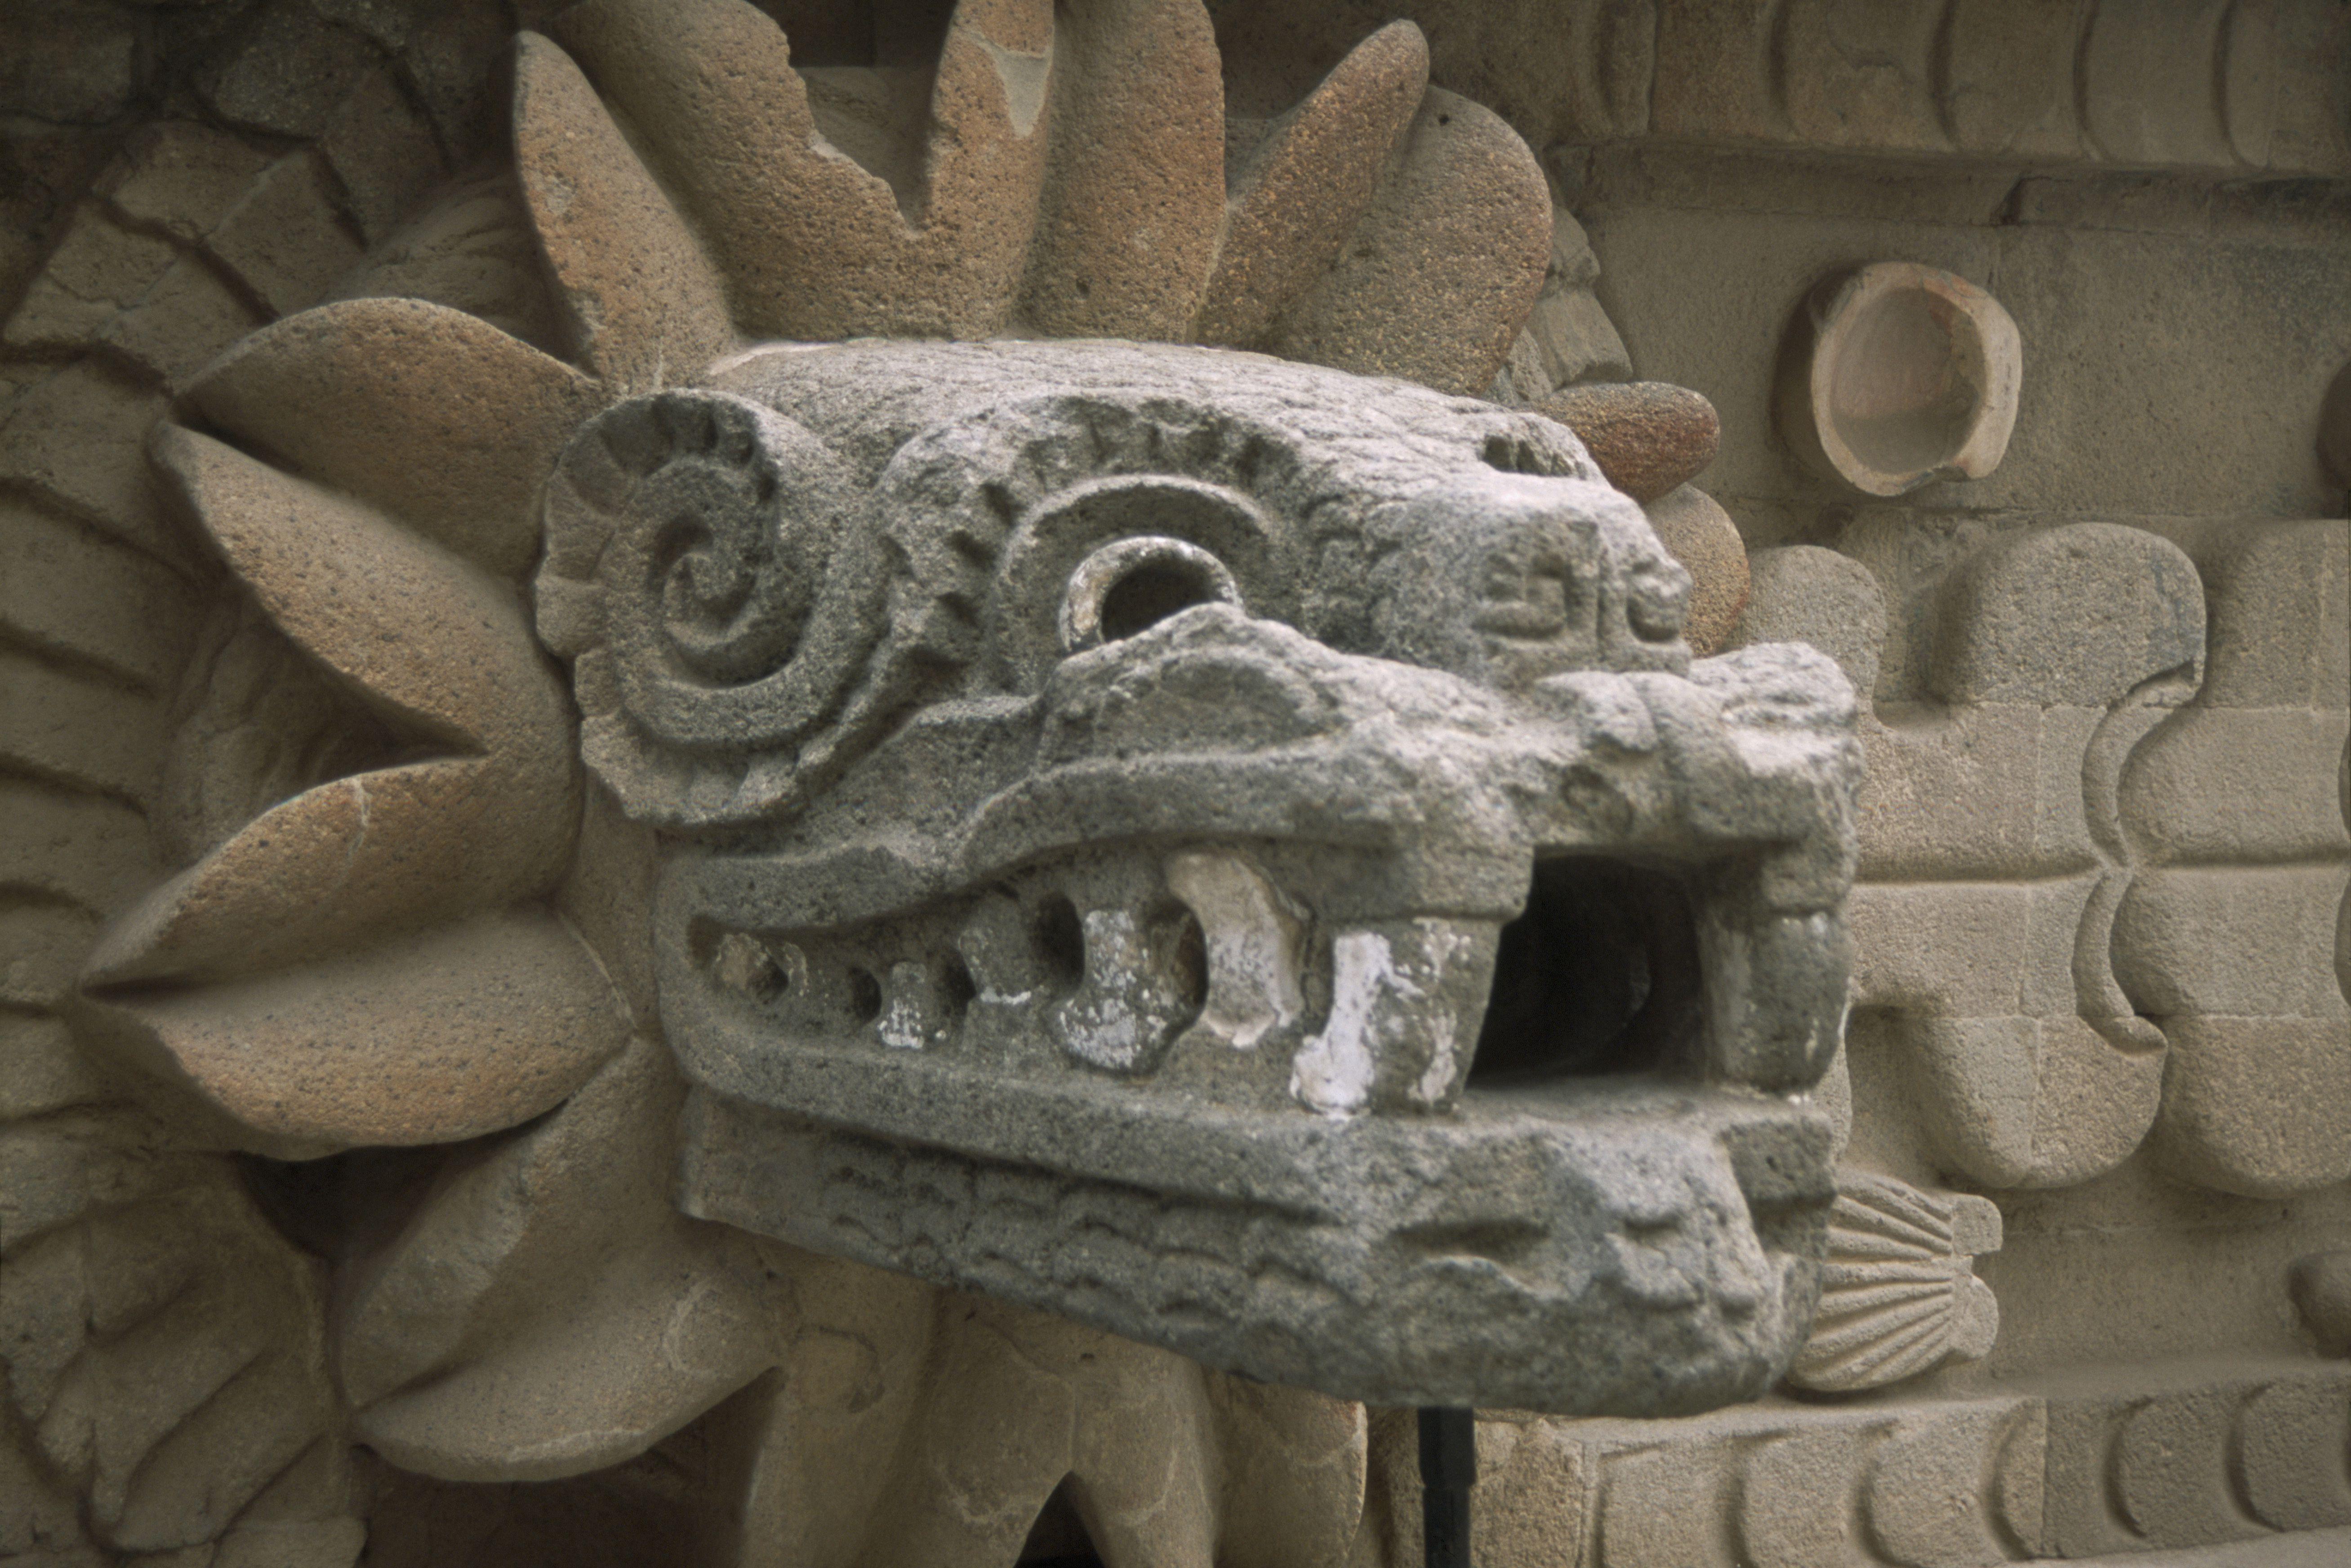 Quetzalcoatl - Pan-Mesoamerican Feathered Serpent God